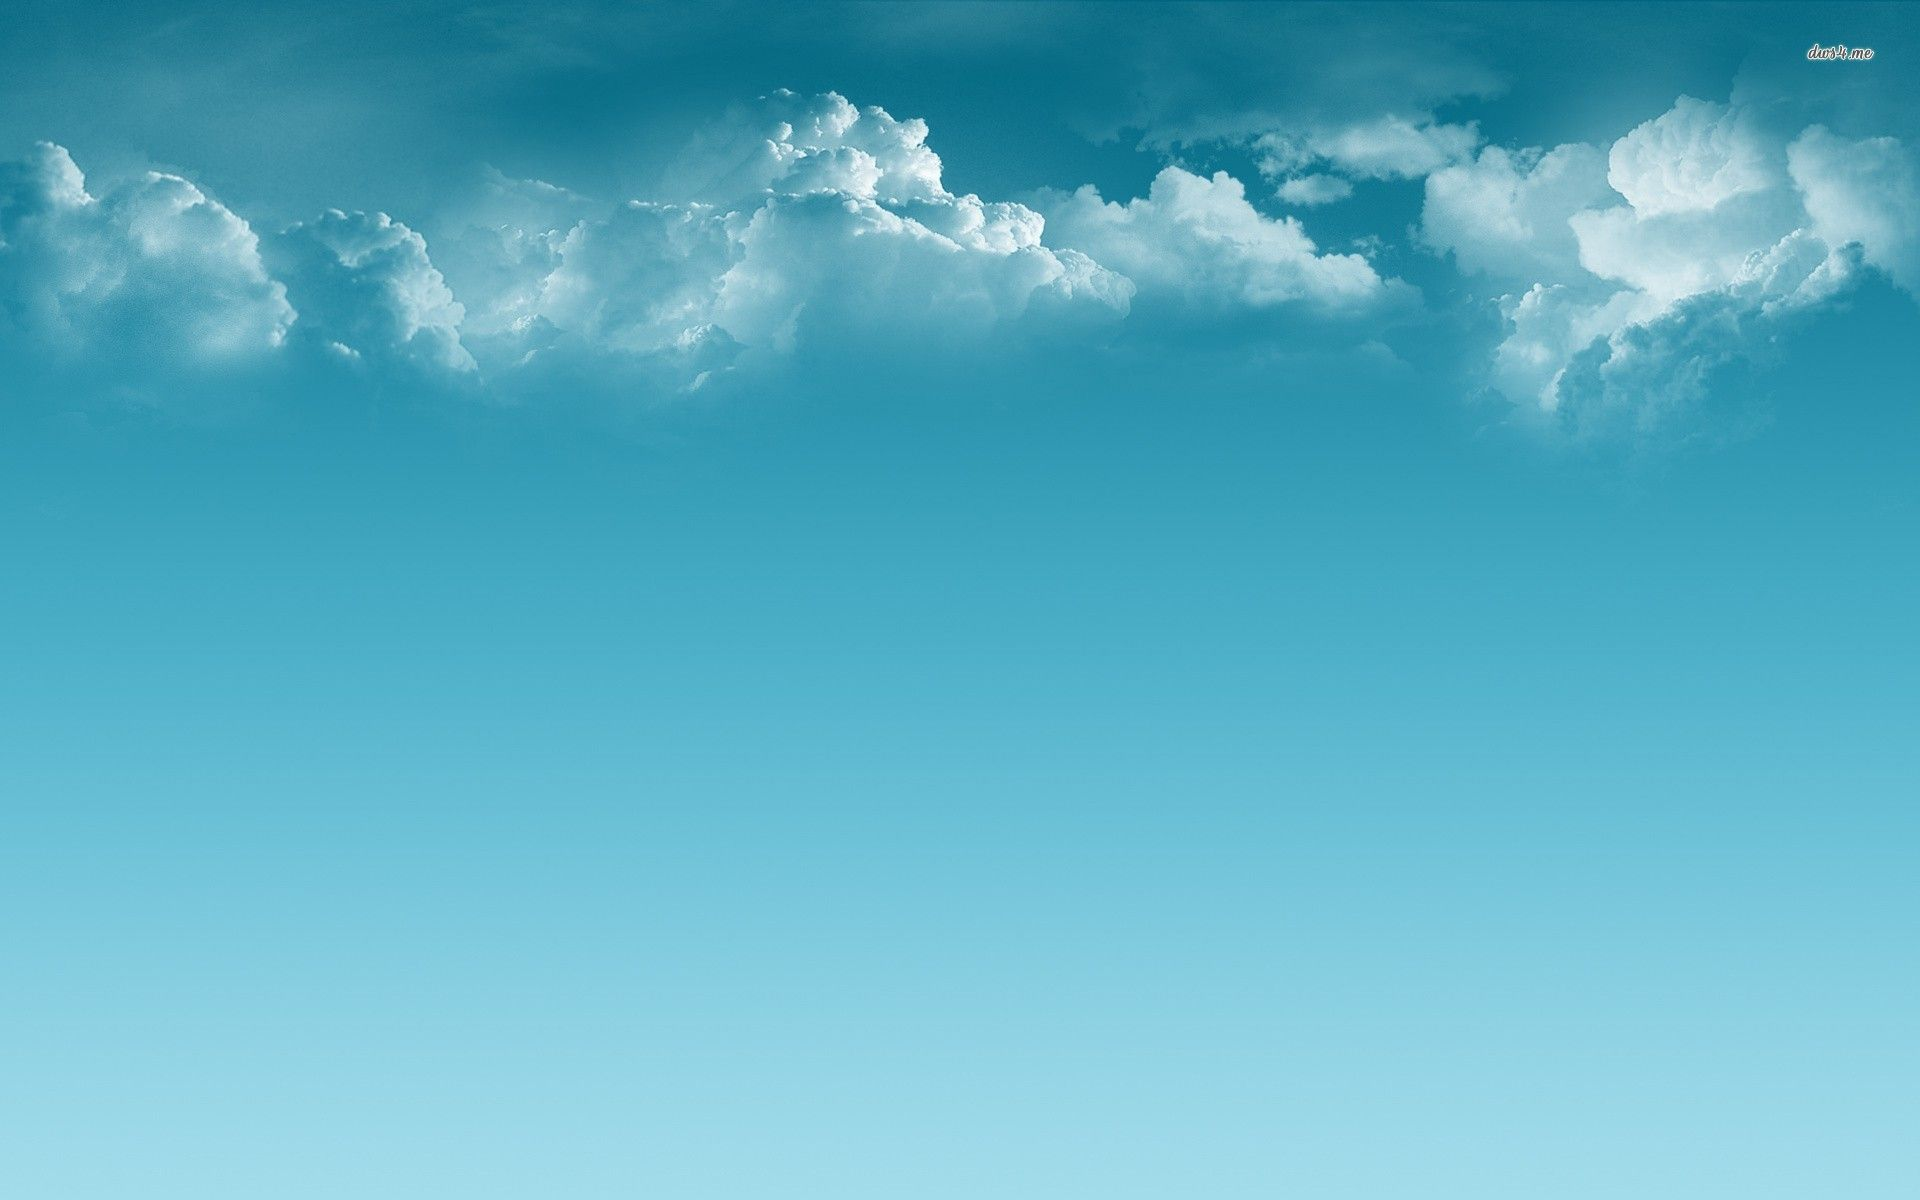 Sky Backgrounds Blue Sky Wallpaper Sky Wallpaper Blue Sky Clouds